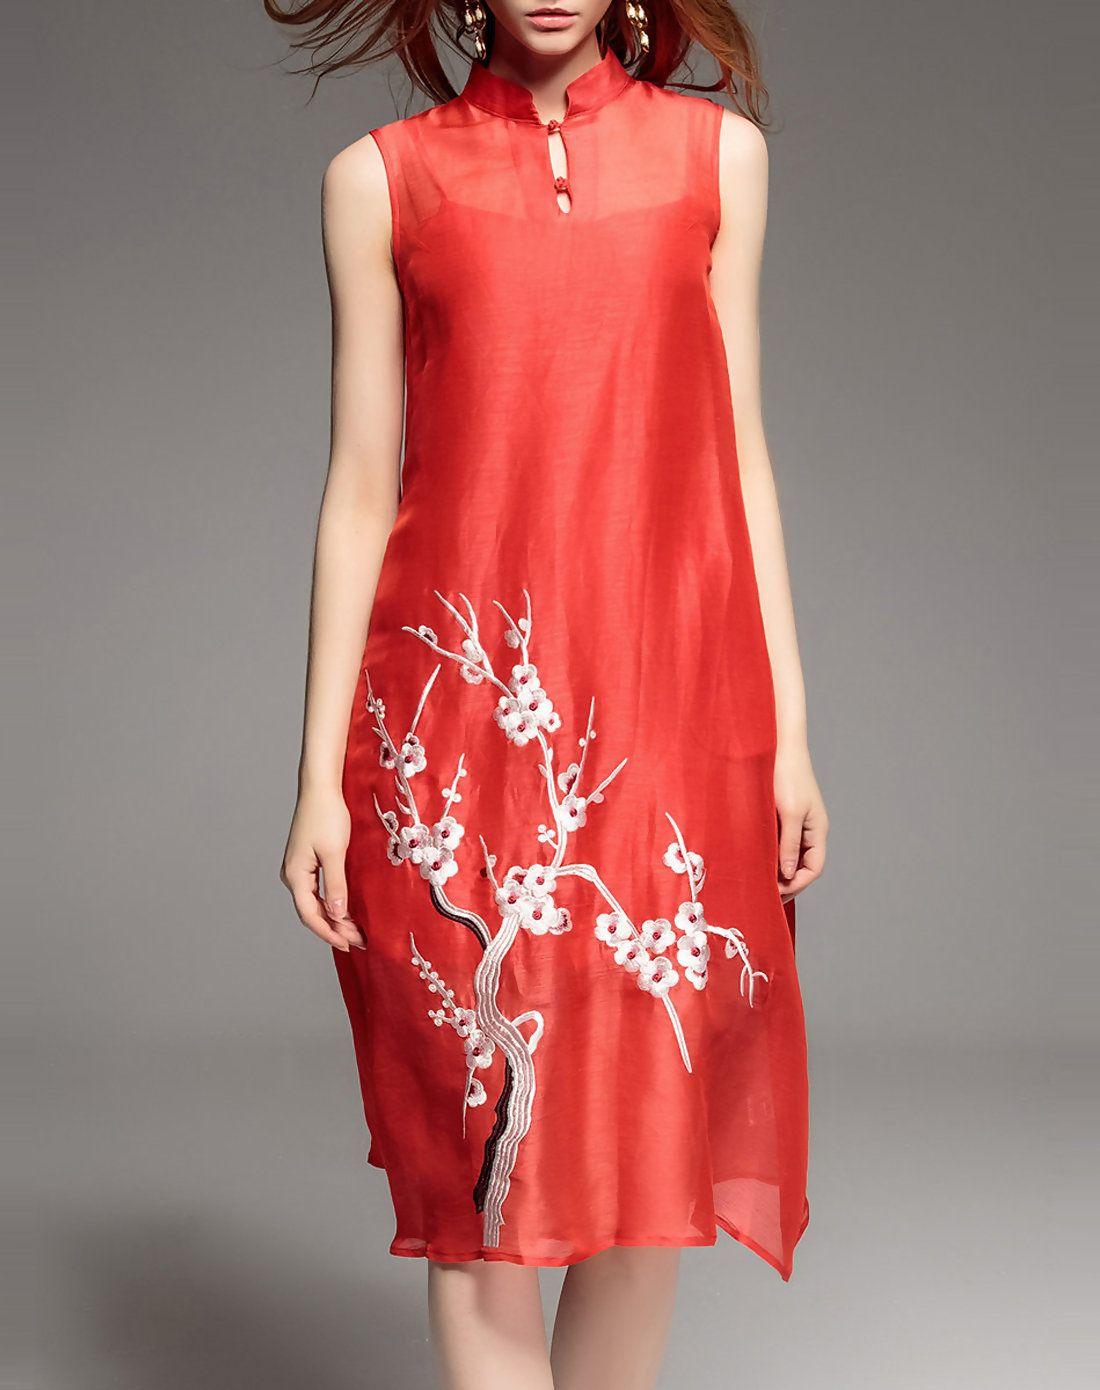 Green dress on pale skin  AdoreWe CHARSU Stunning Red Silk Embroidered Vintage Floral Midi